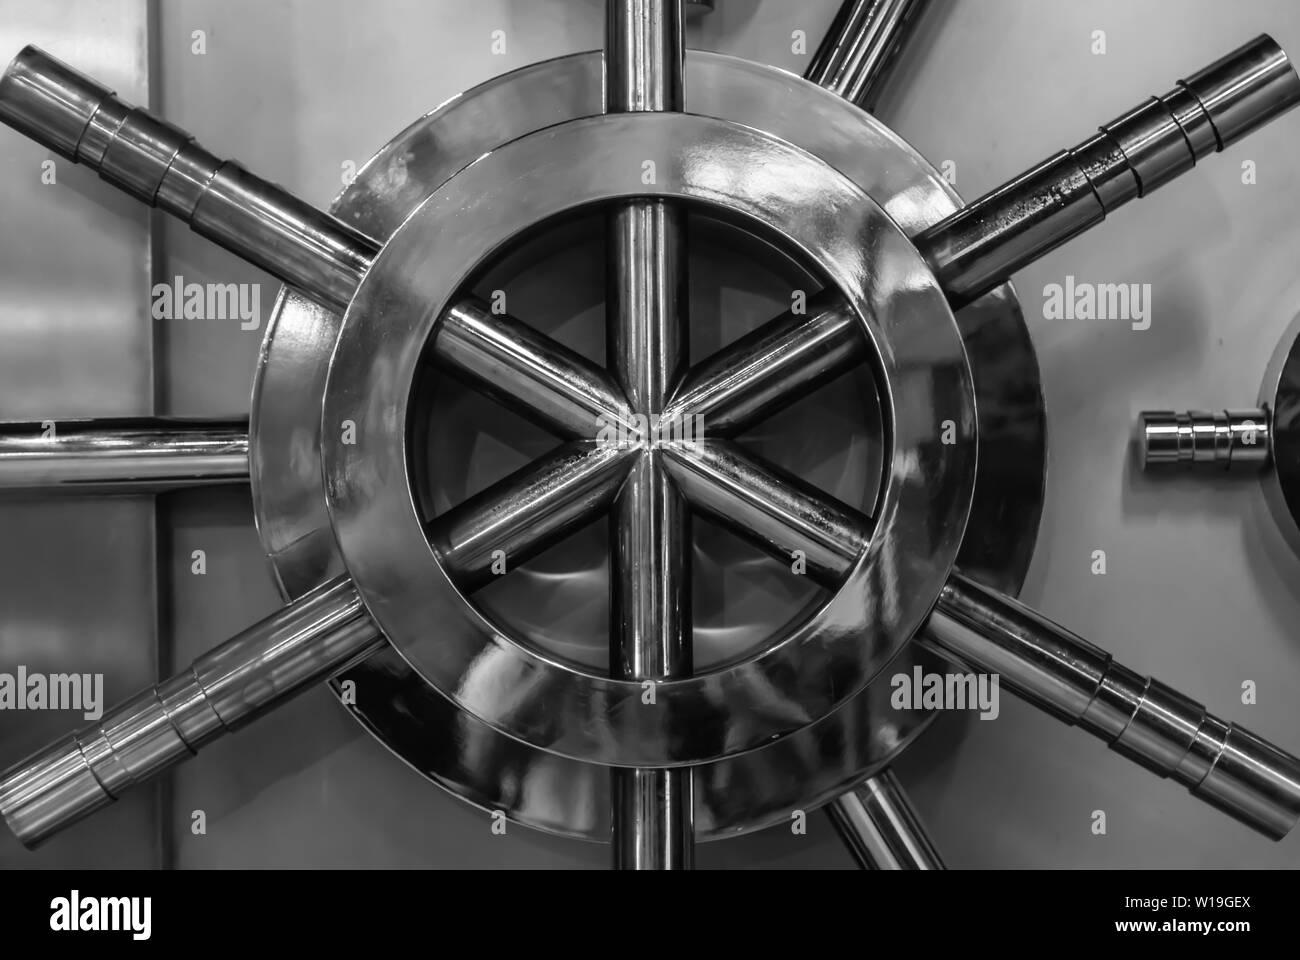 silver color bank security door facade closeup - Stock Image